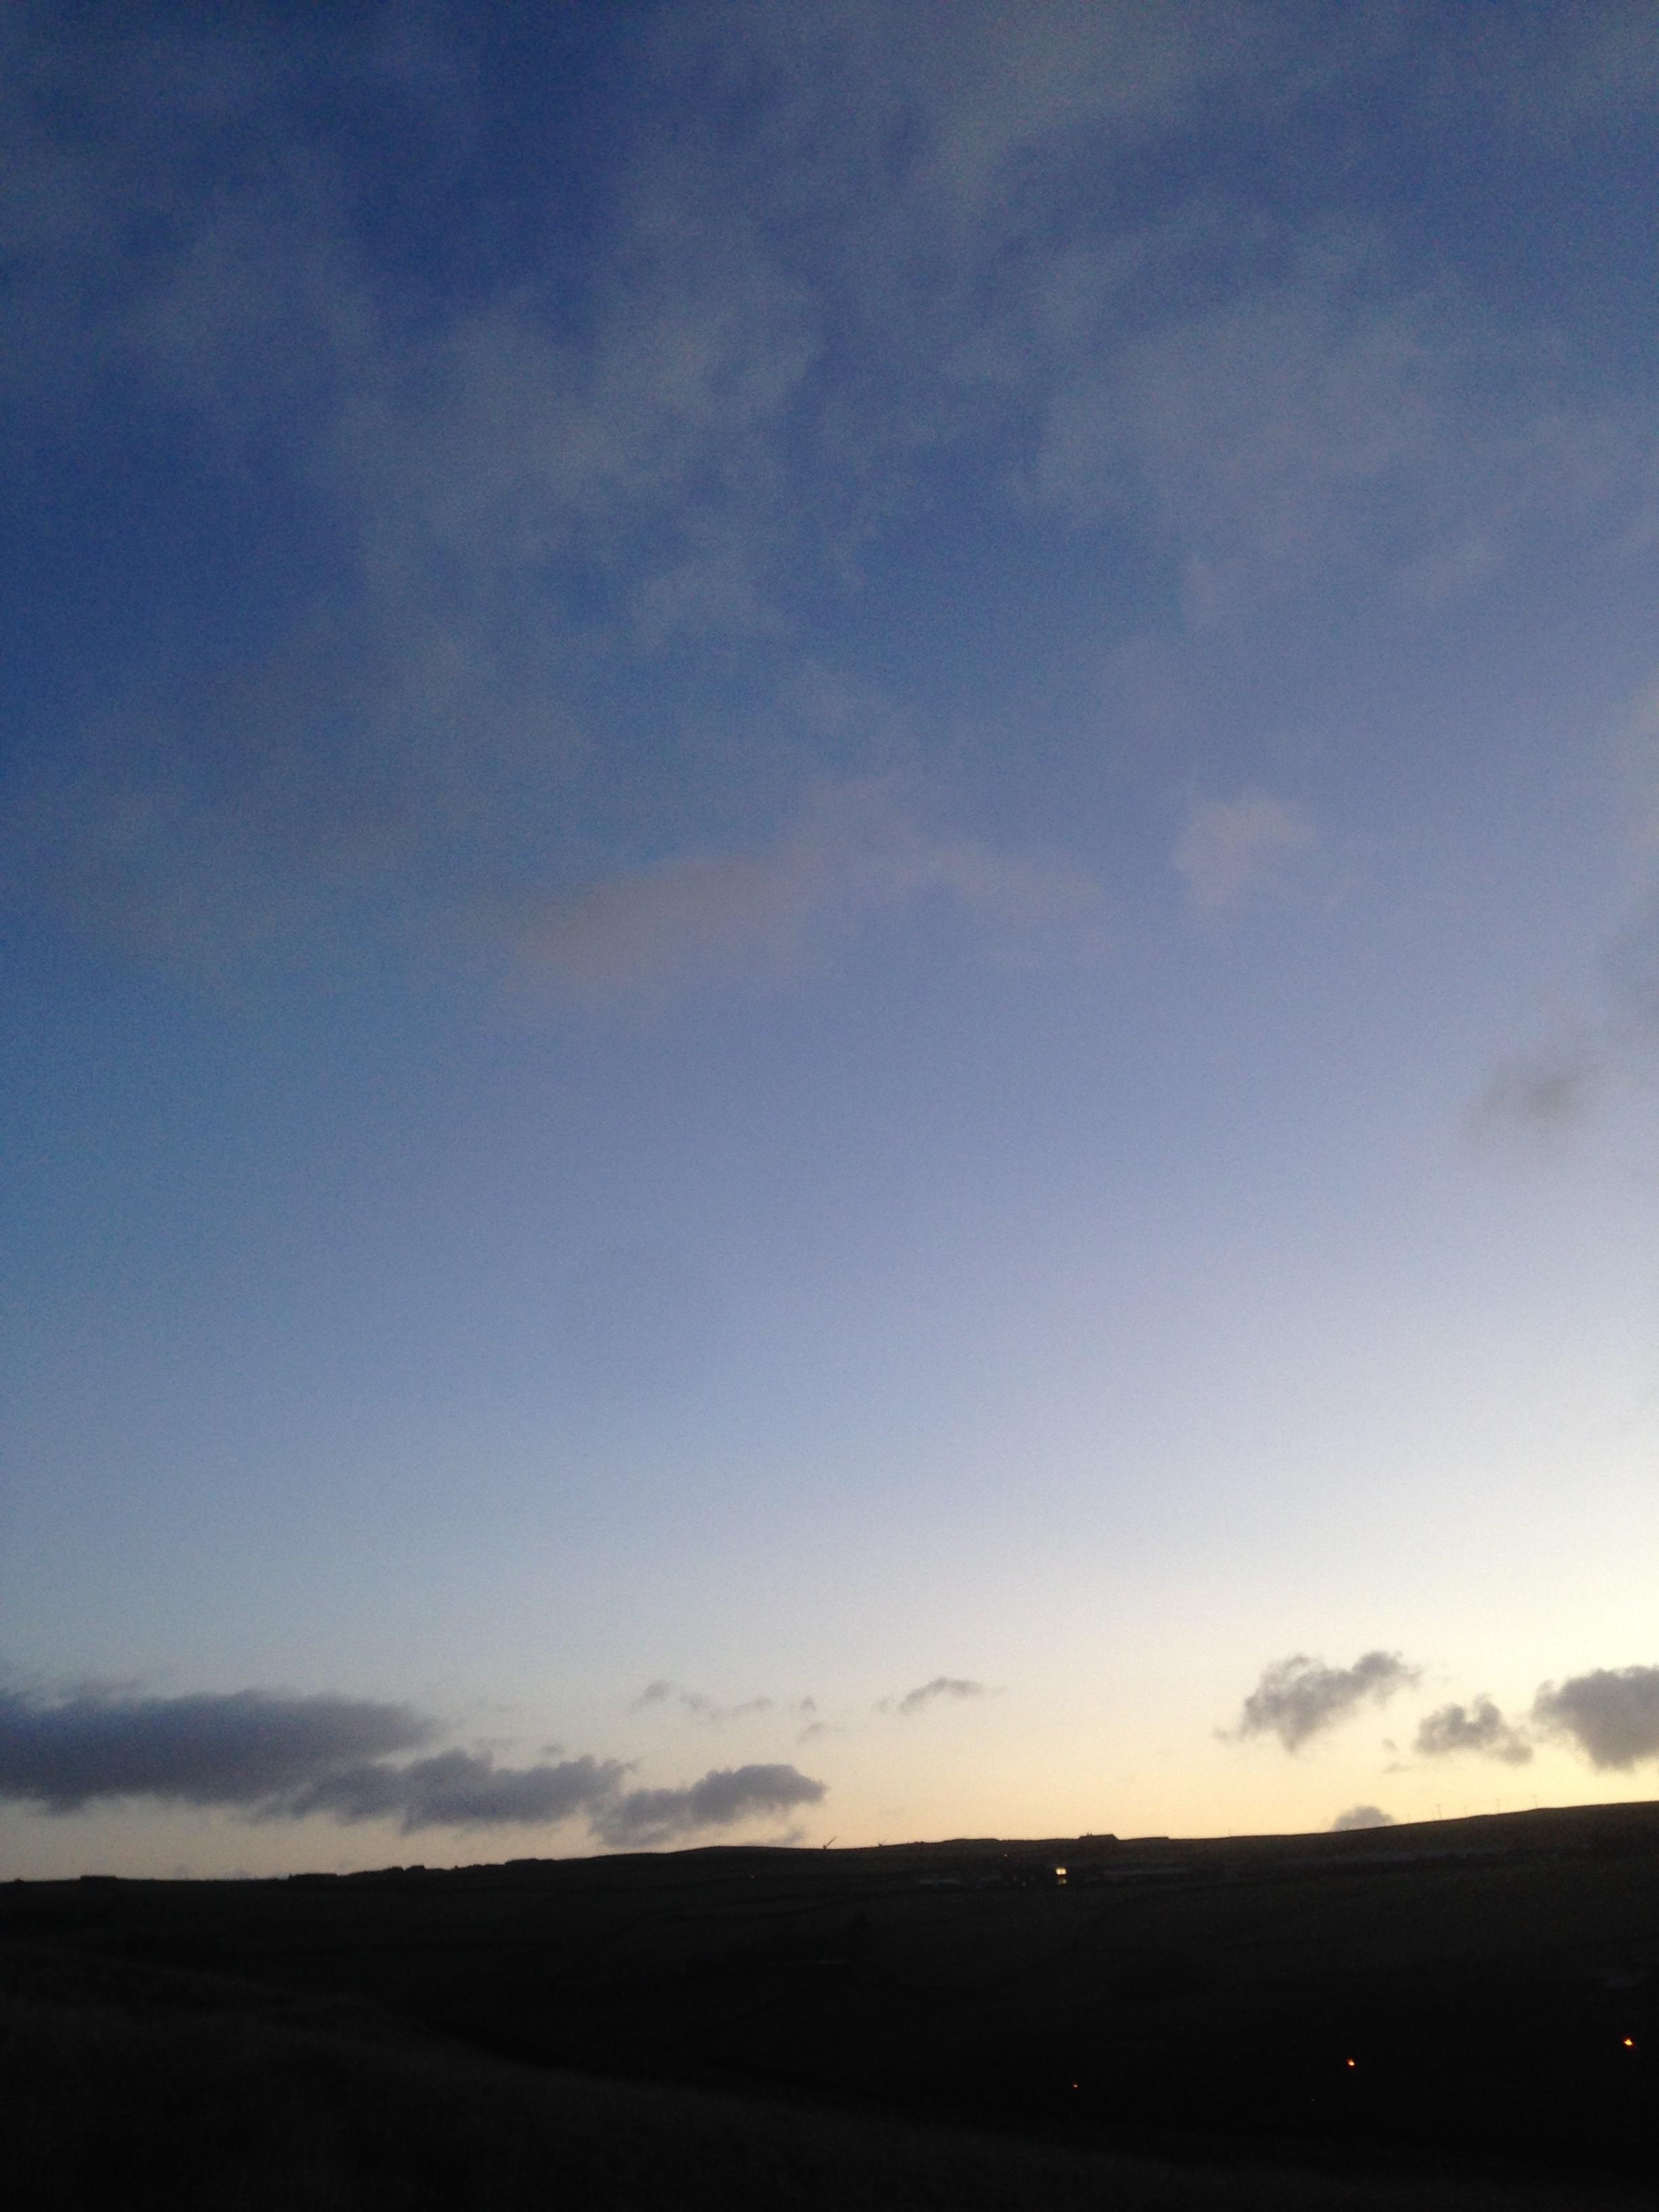 Just before sunrise on Friday 19/12/14